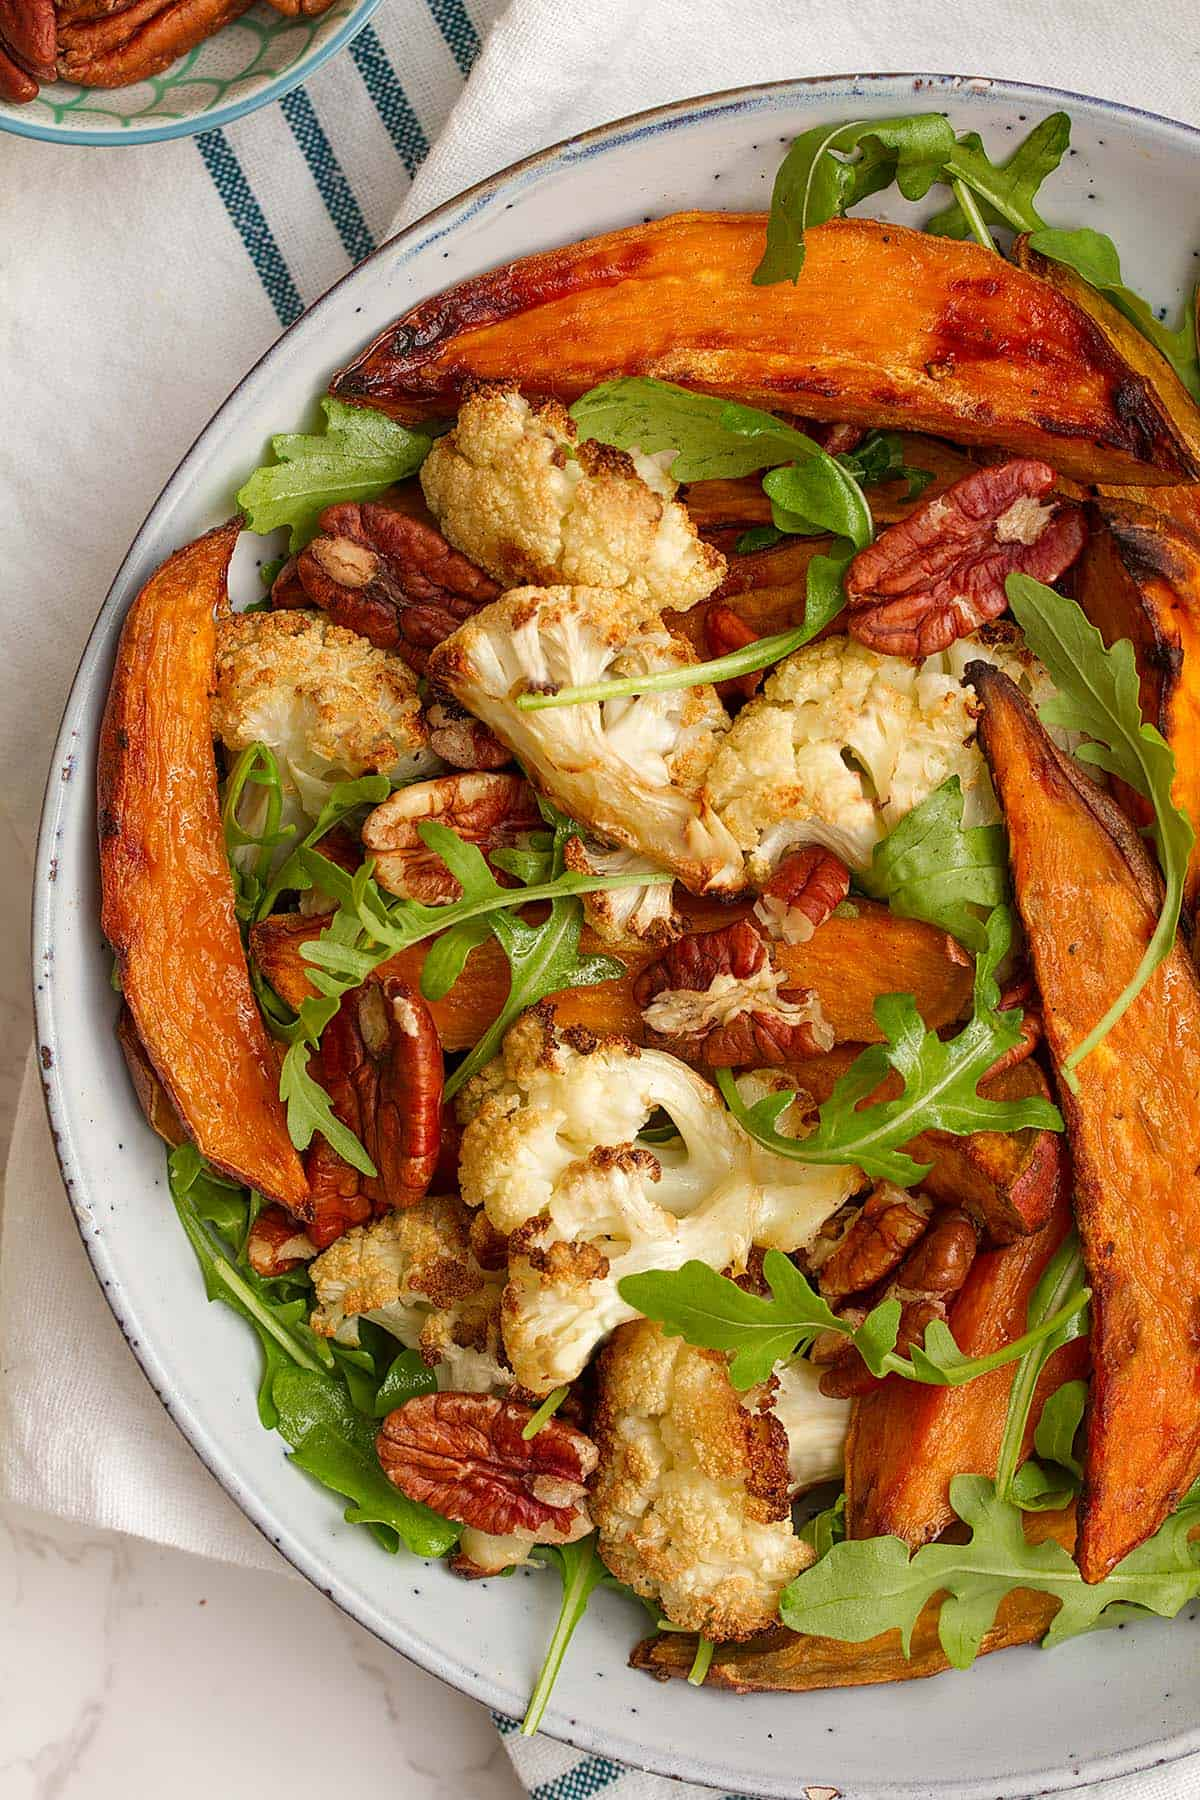 Sweet potato salad in bowl